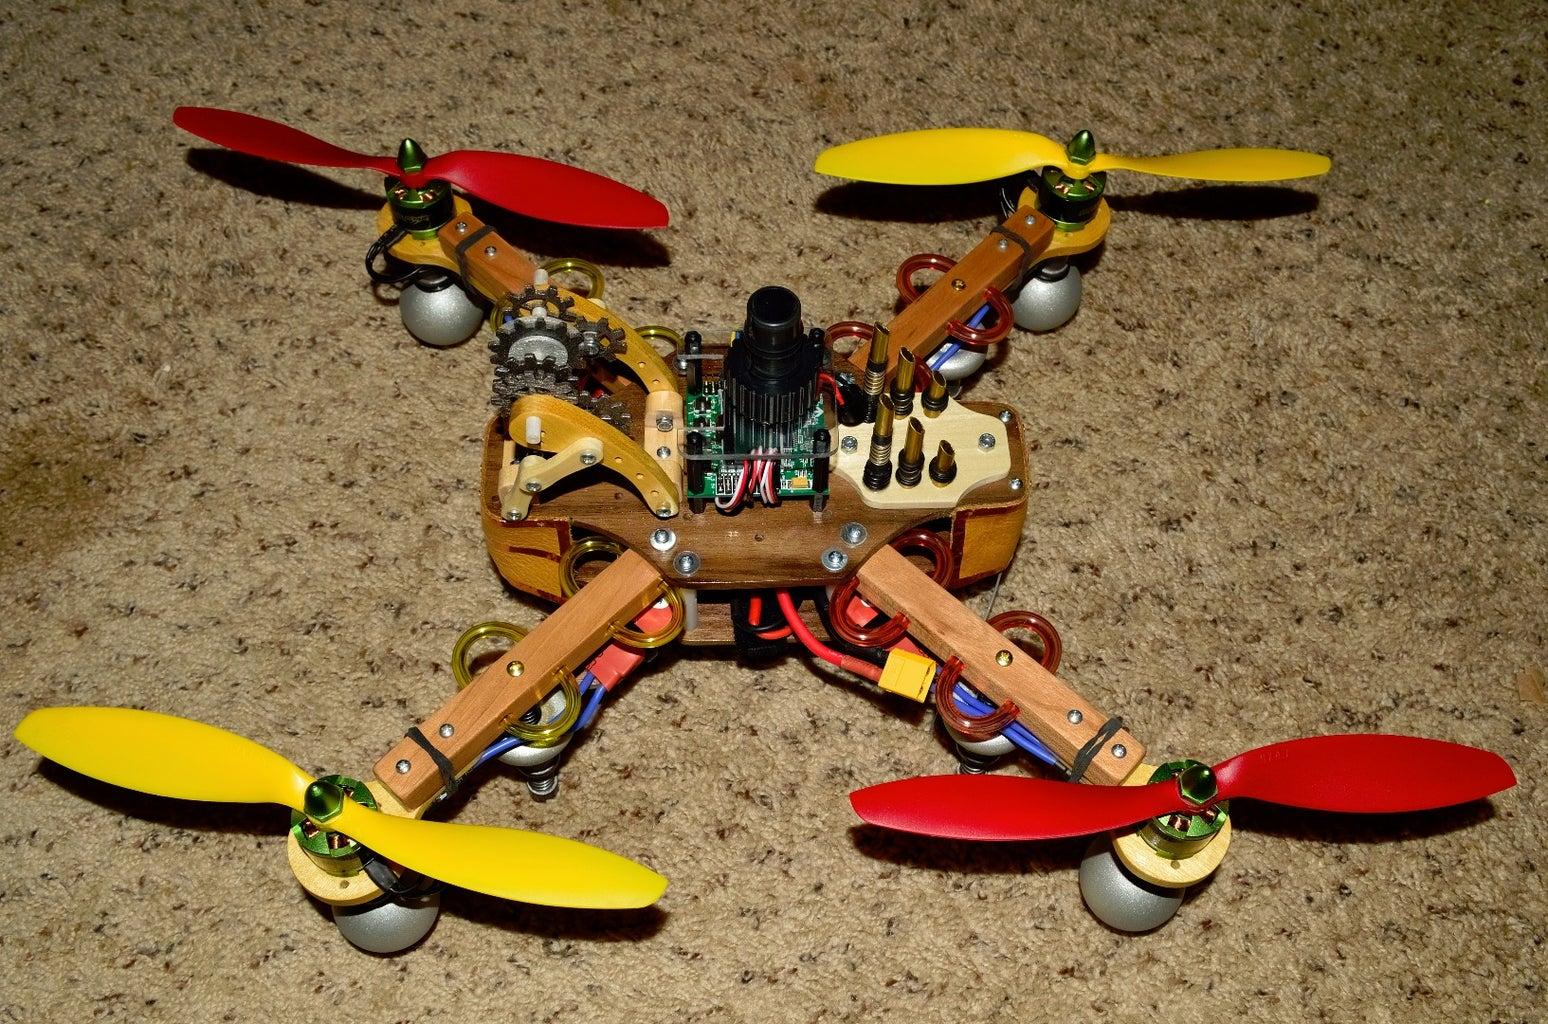 Steam Punk Flying Drone